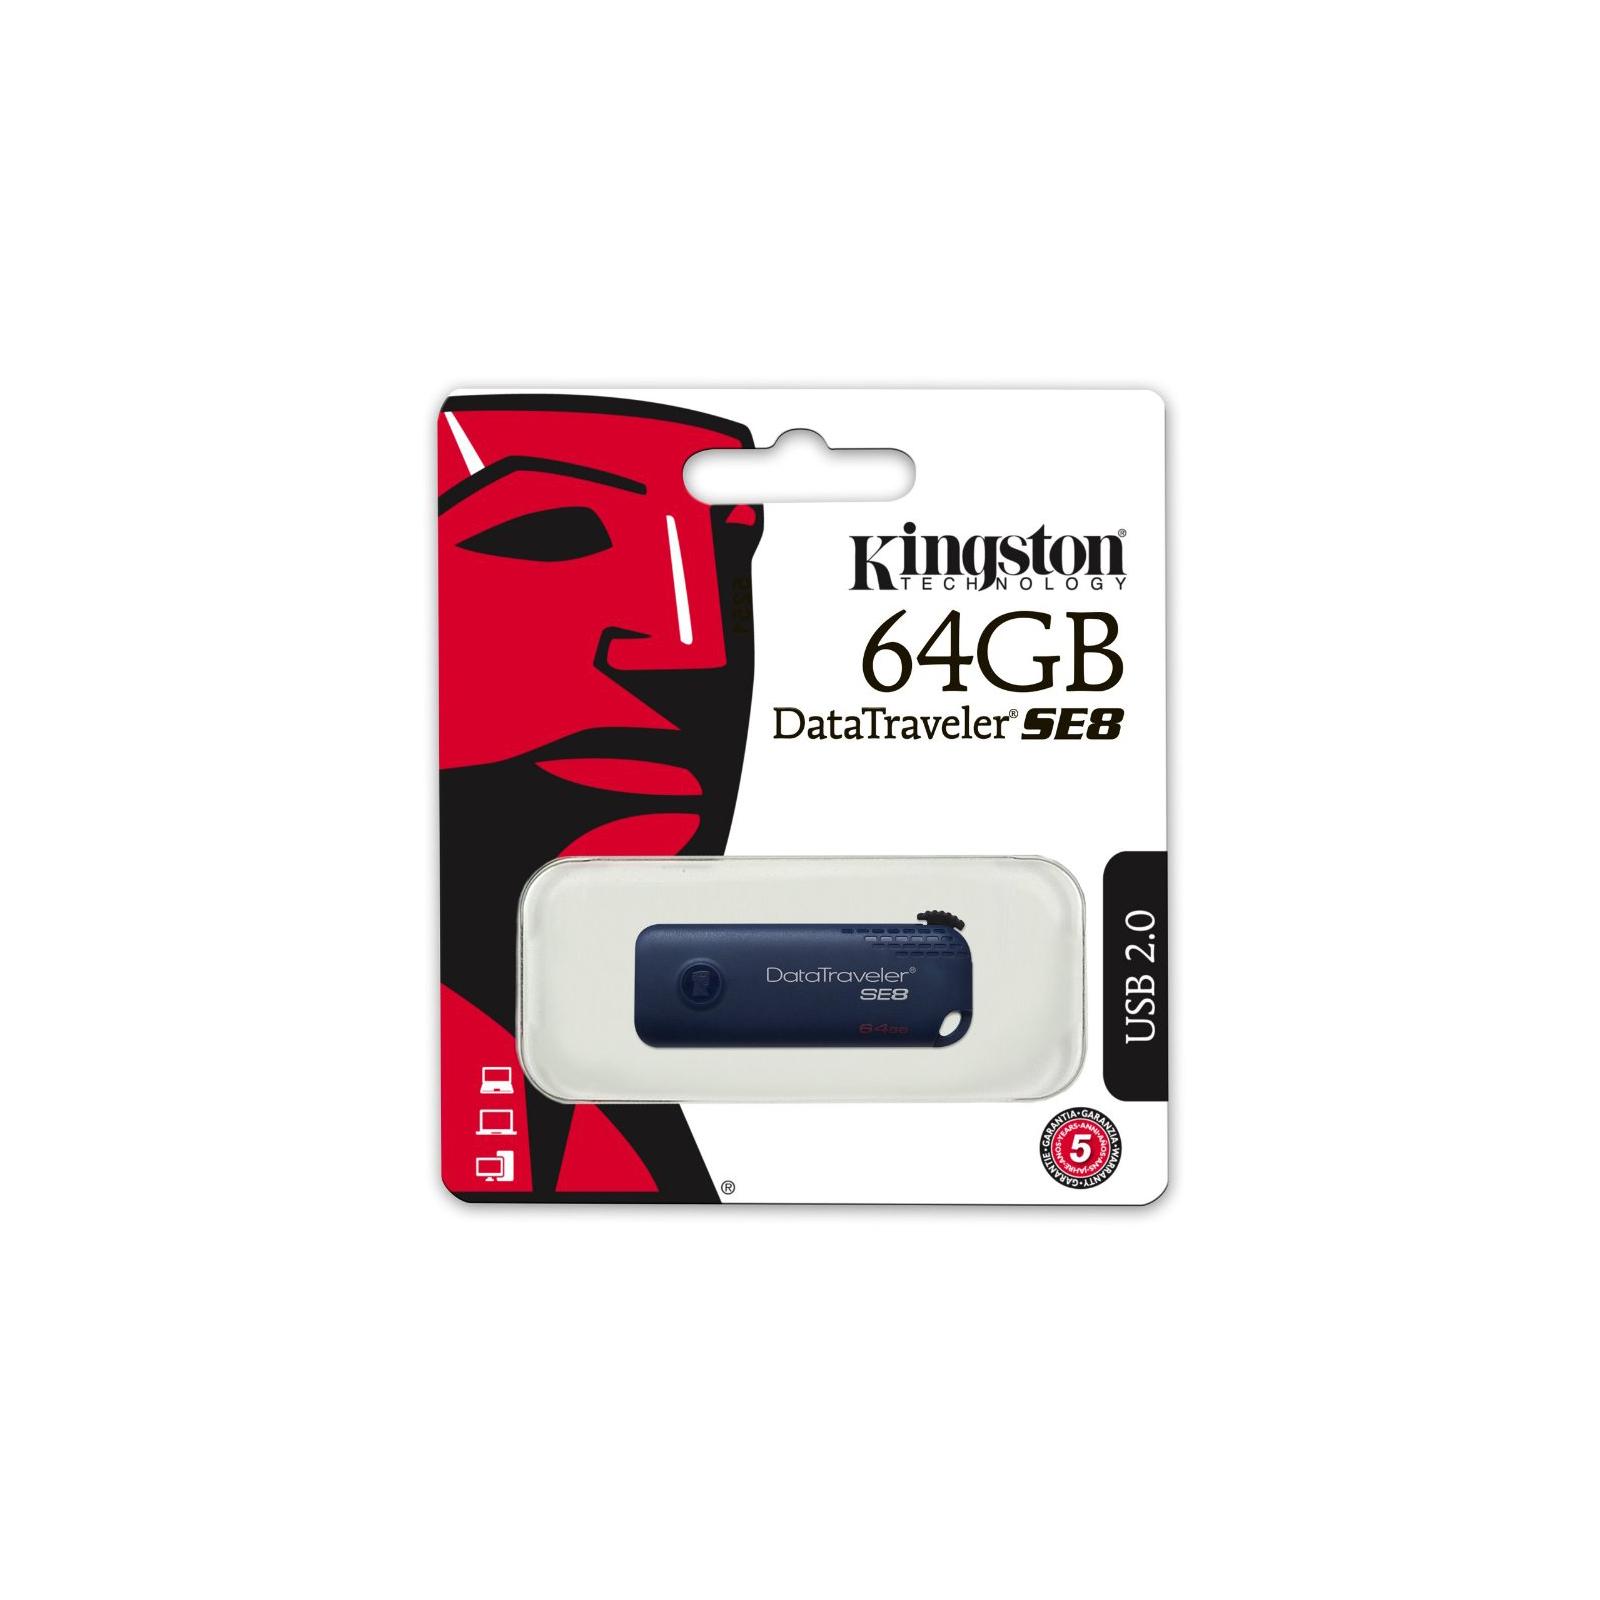 USB флеш накопитель Kingston 64GB DT SE 8 Blue USB 2.0 (DTSE8/64GB) изображение 6